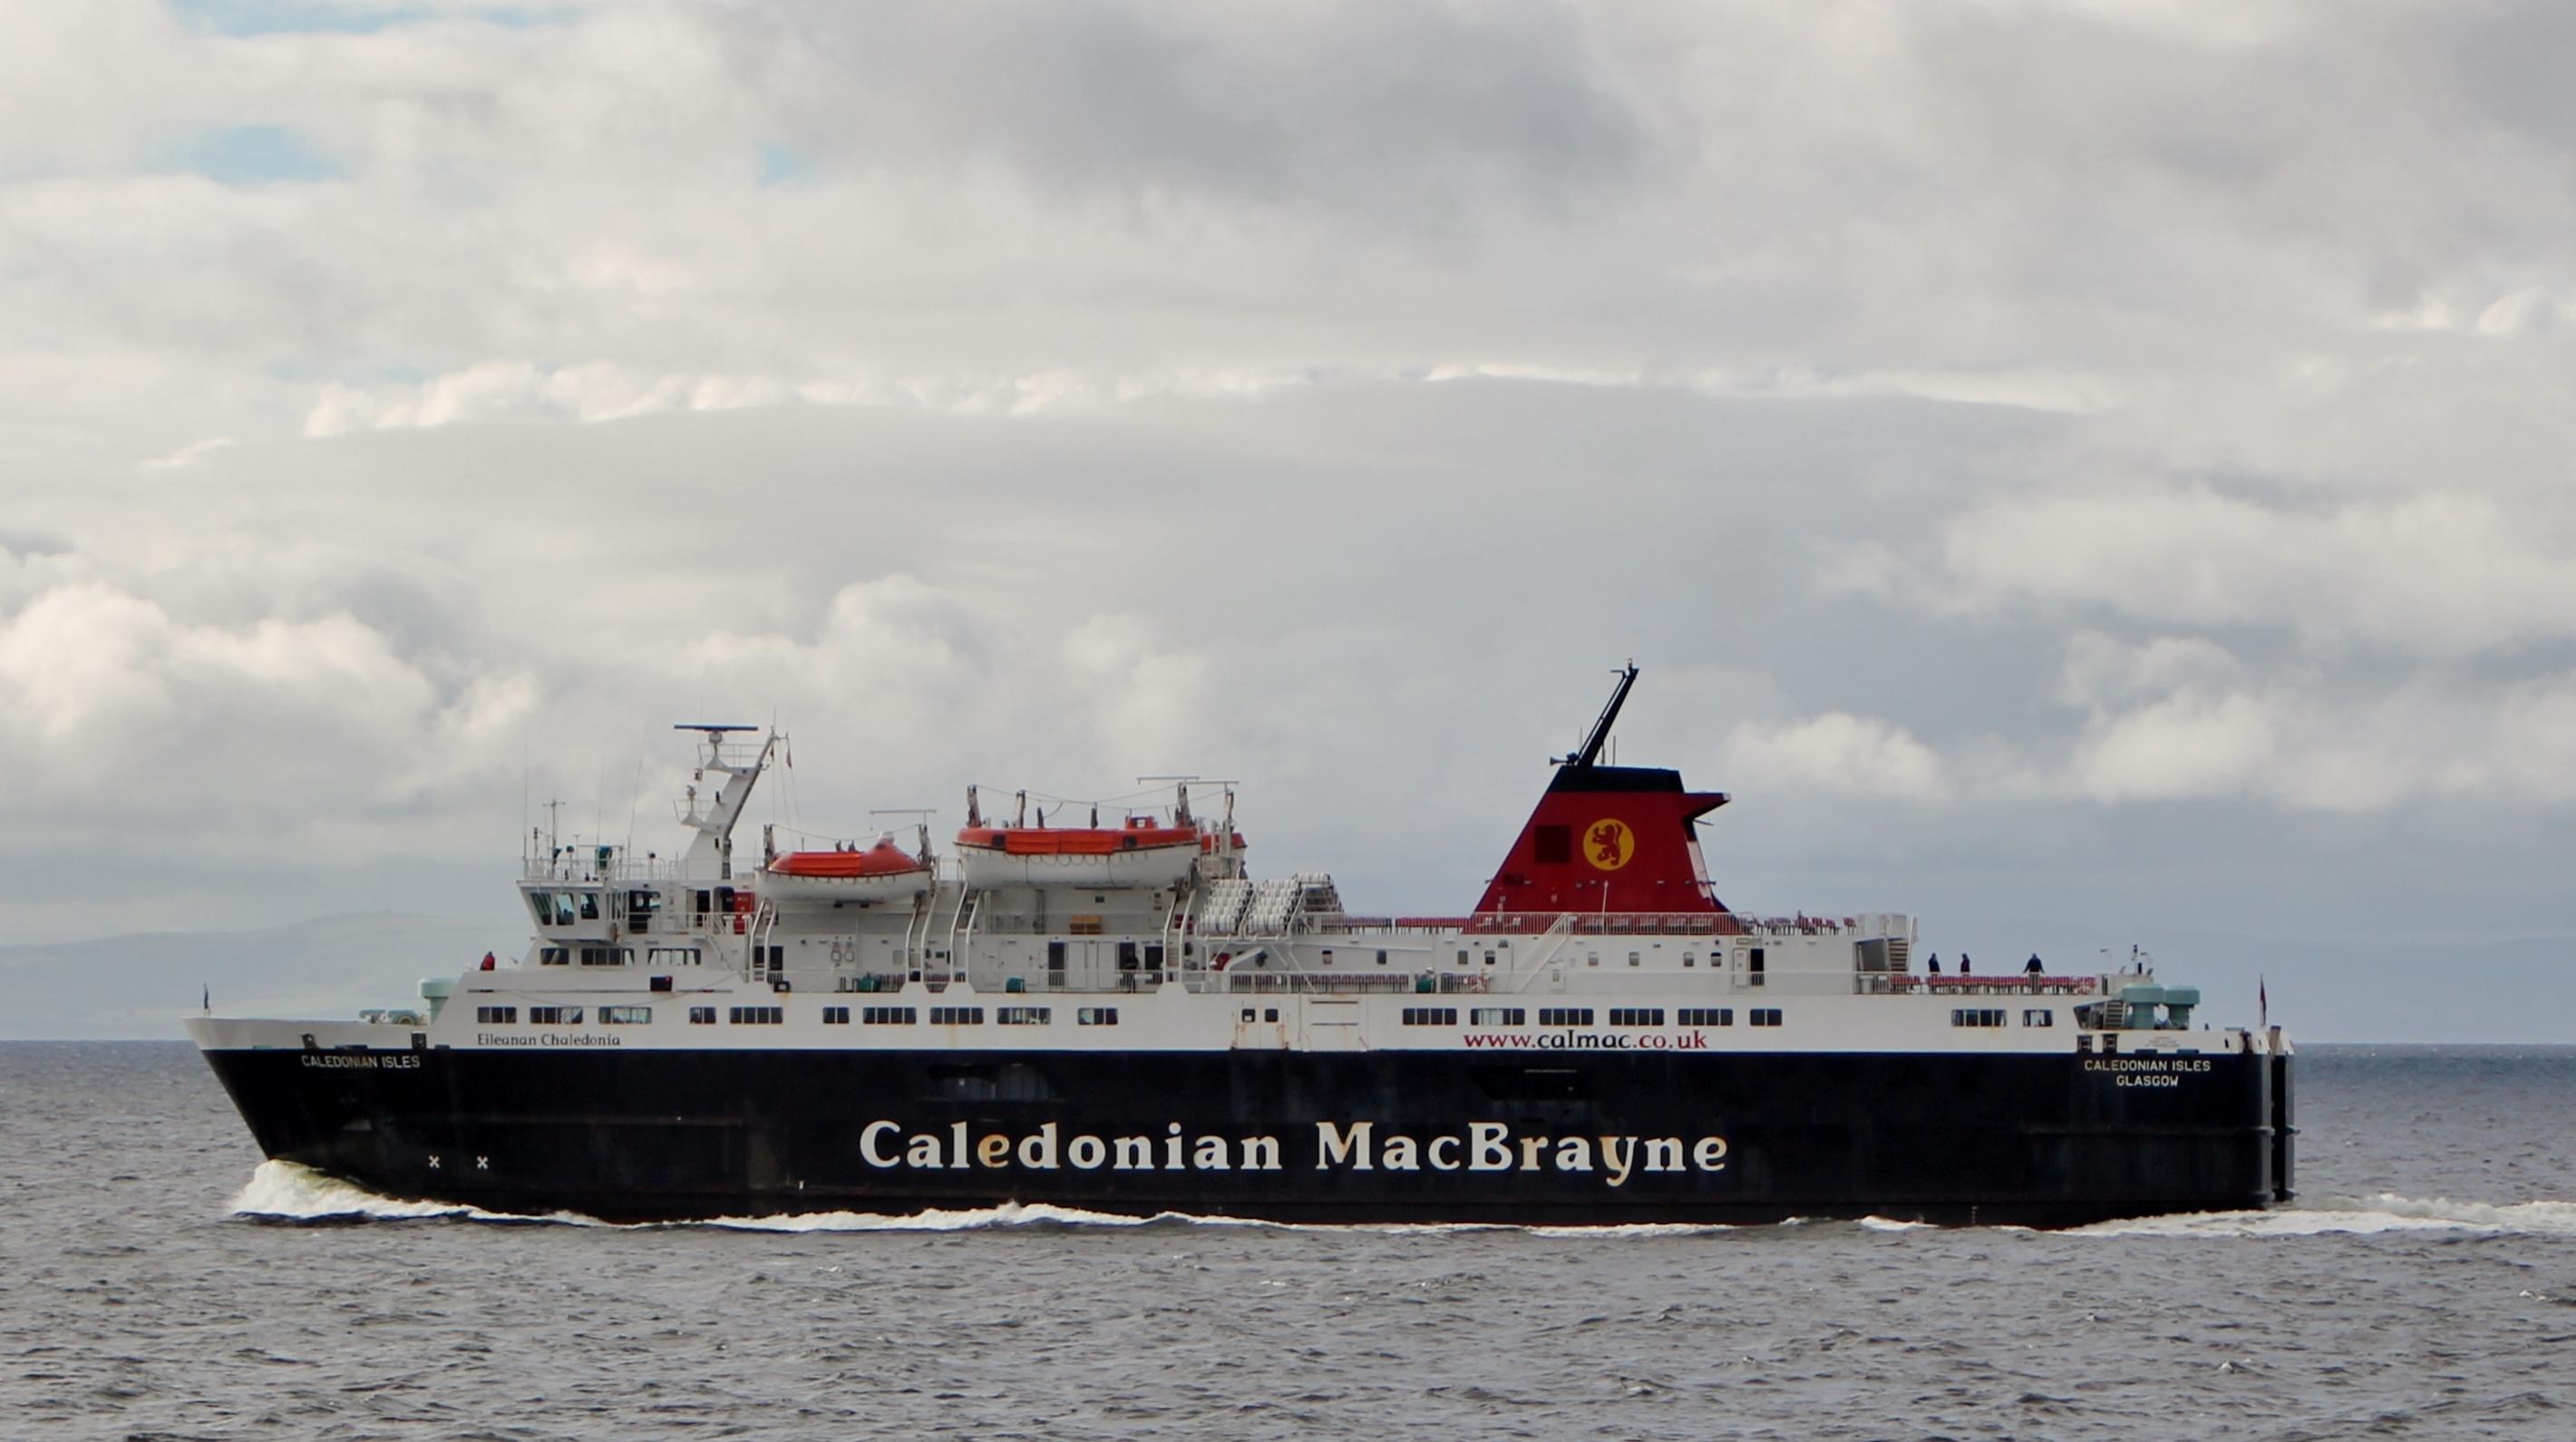 Caledonian Isles crossing to the mainland (Ships of CalMac)